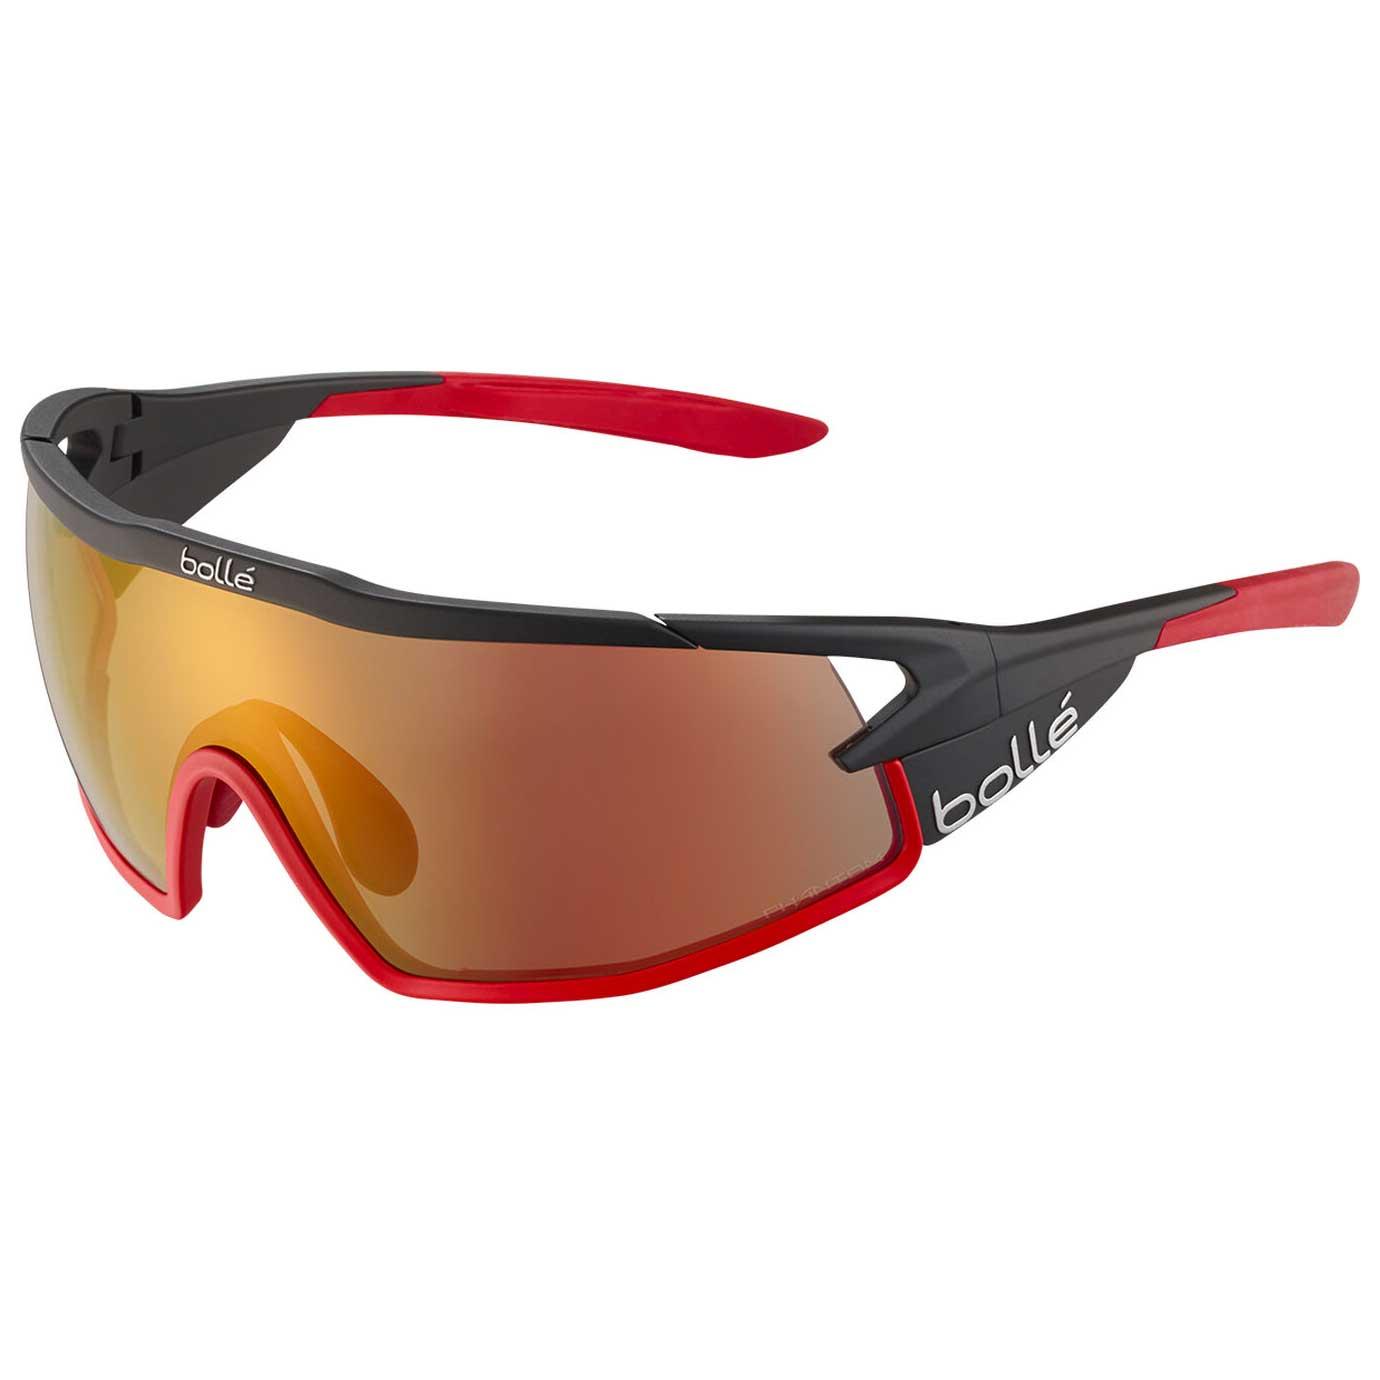 Bollé B-Rock Pro Sunglasses - Matte Black - Phantom Brown Red